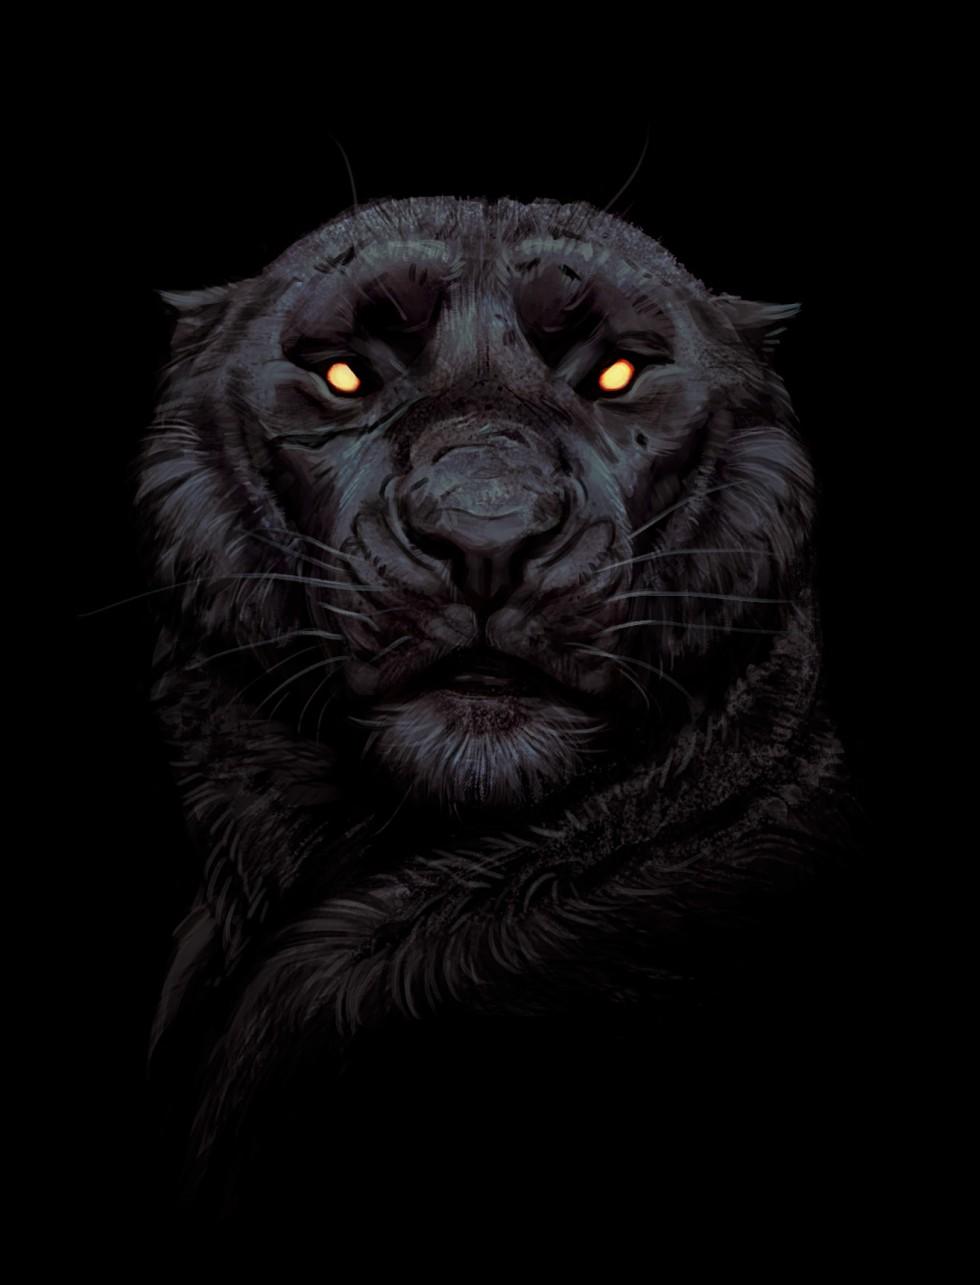 maria zolotukhina - panther